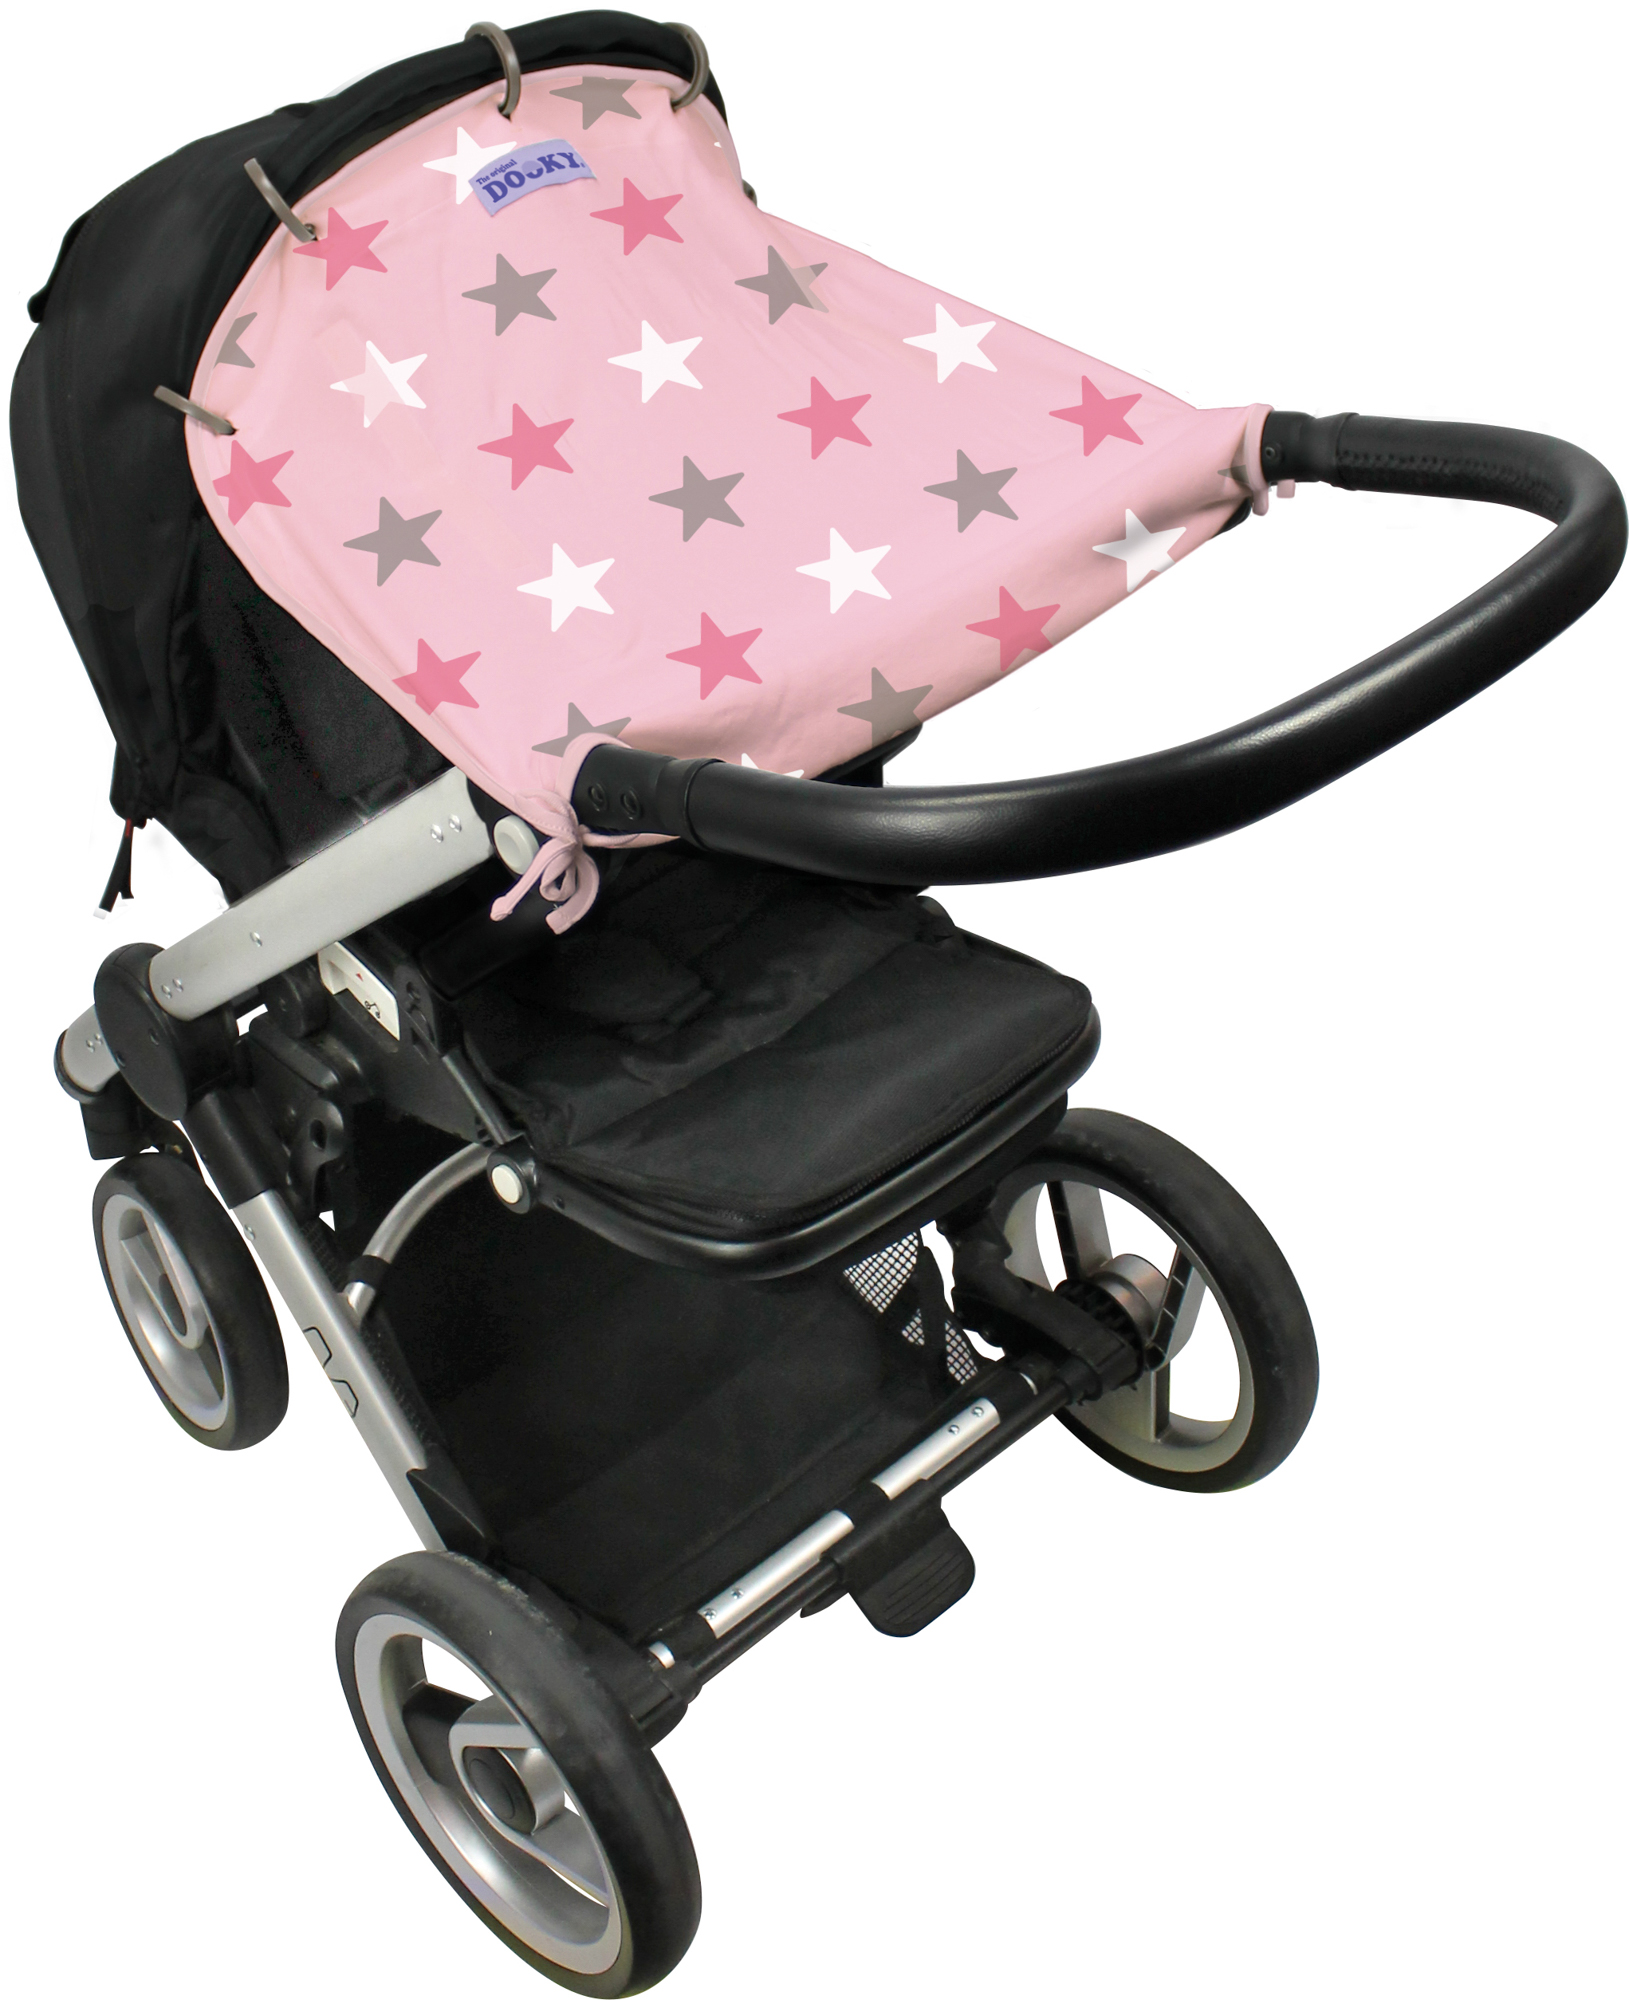 The Original Dooky Pram Sunshade UV Protector SPF50 - Pink Stars